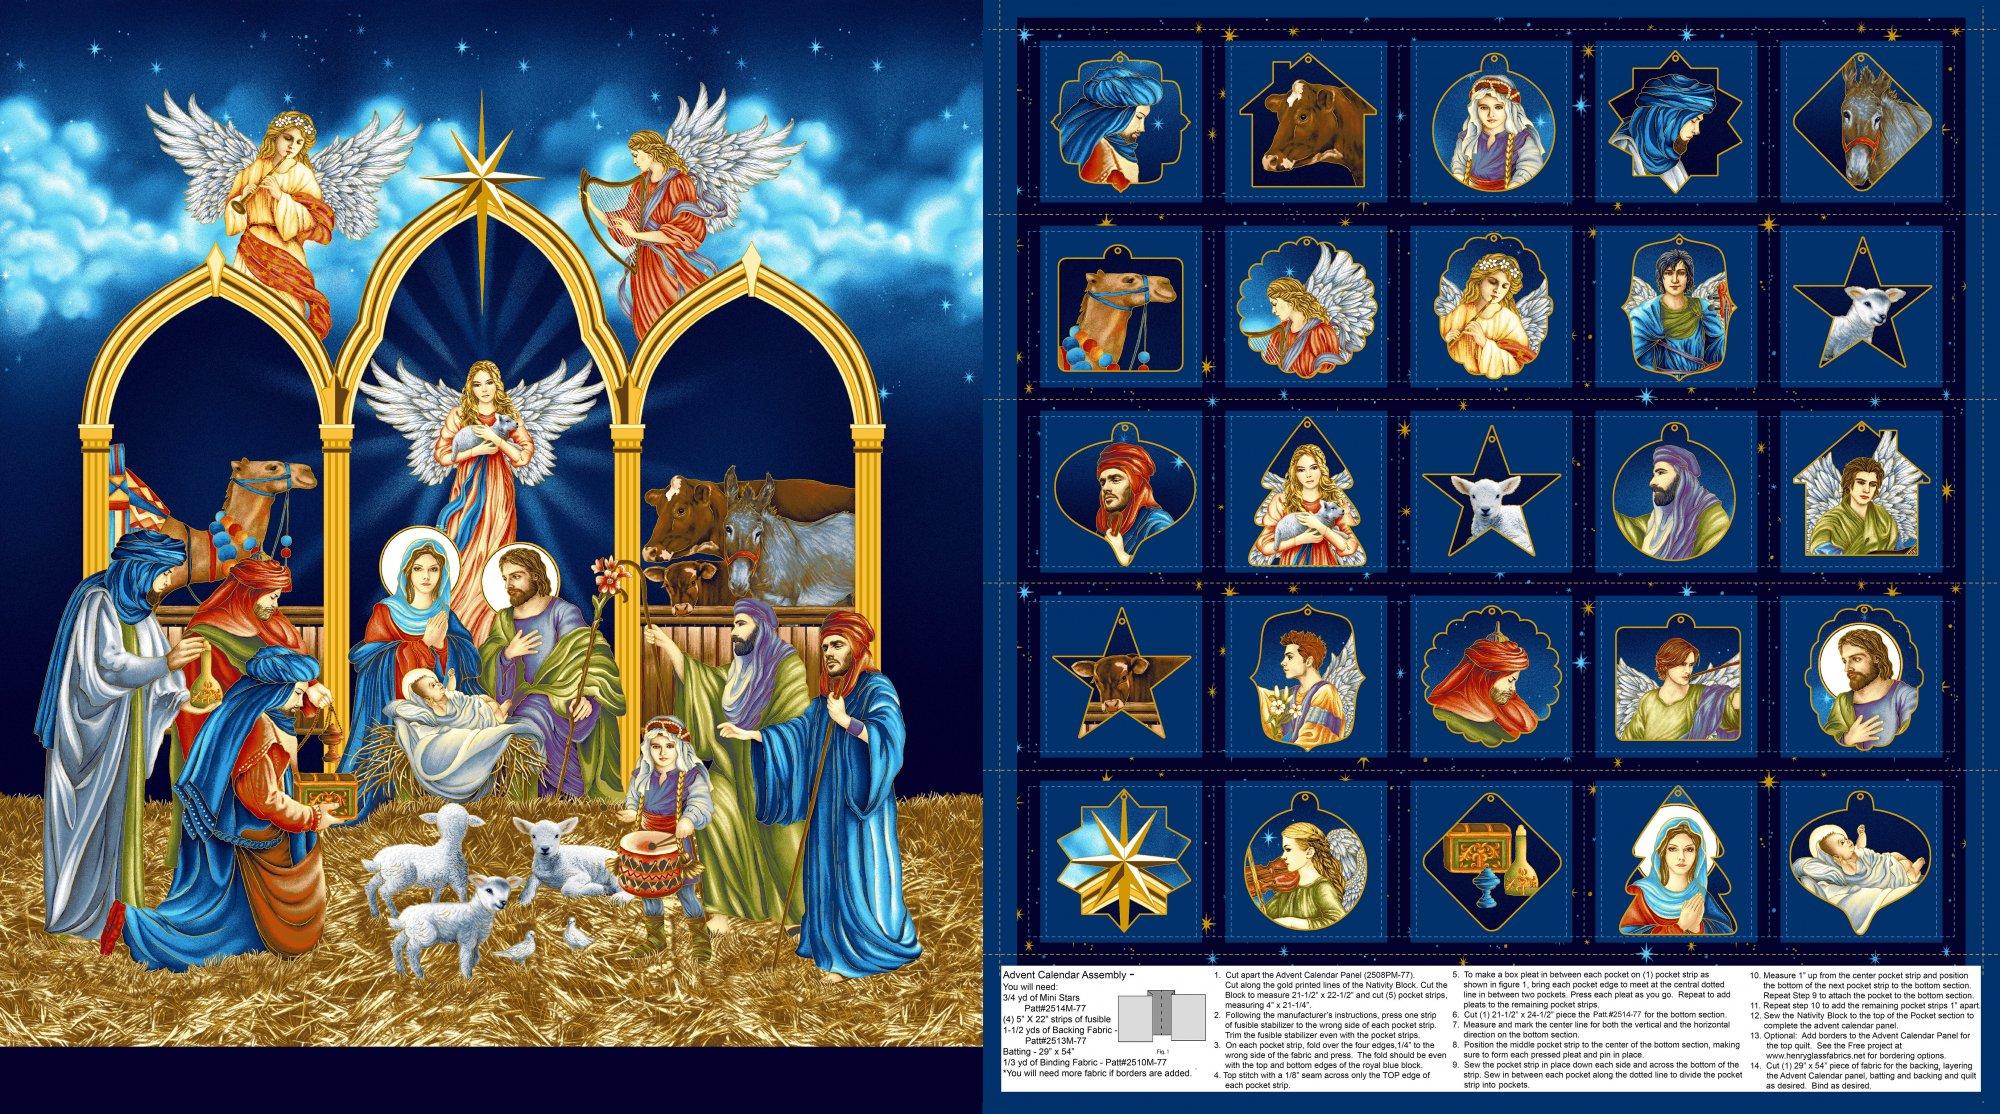 HG-Silent Night (Metallic) 2508PM-77 Midnight - Advent Calendar Panel